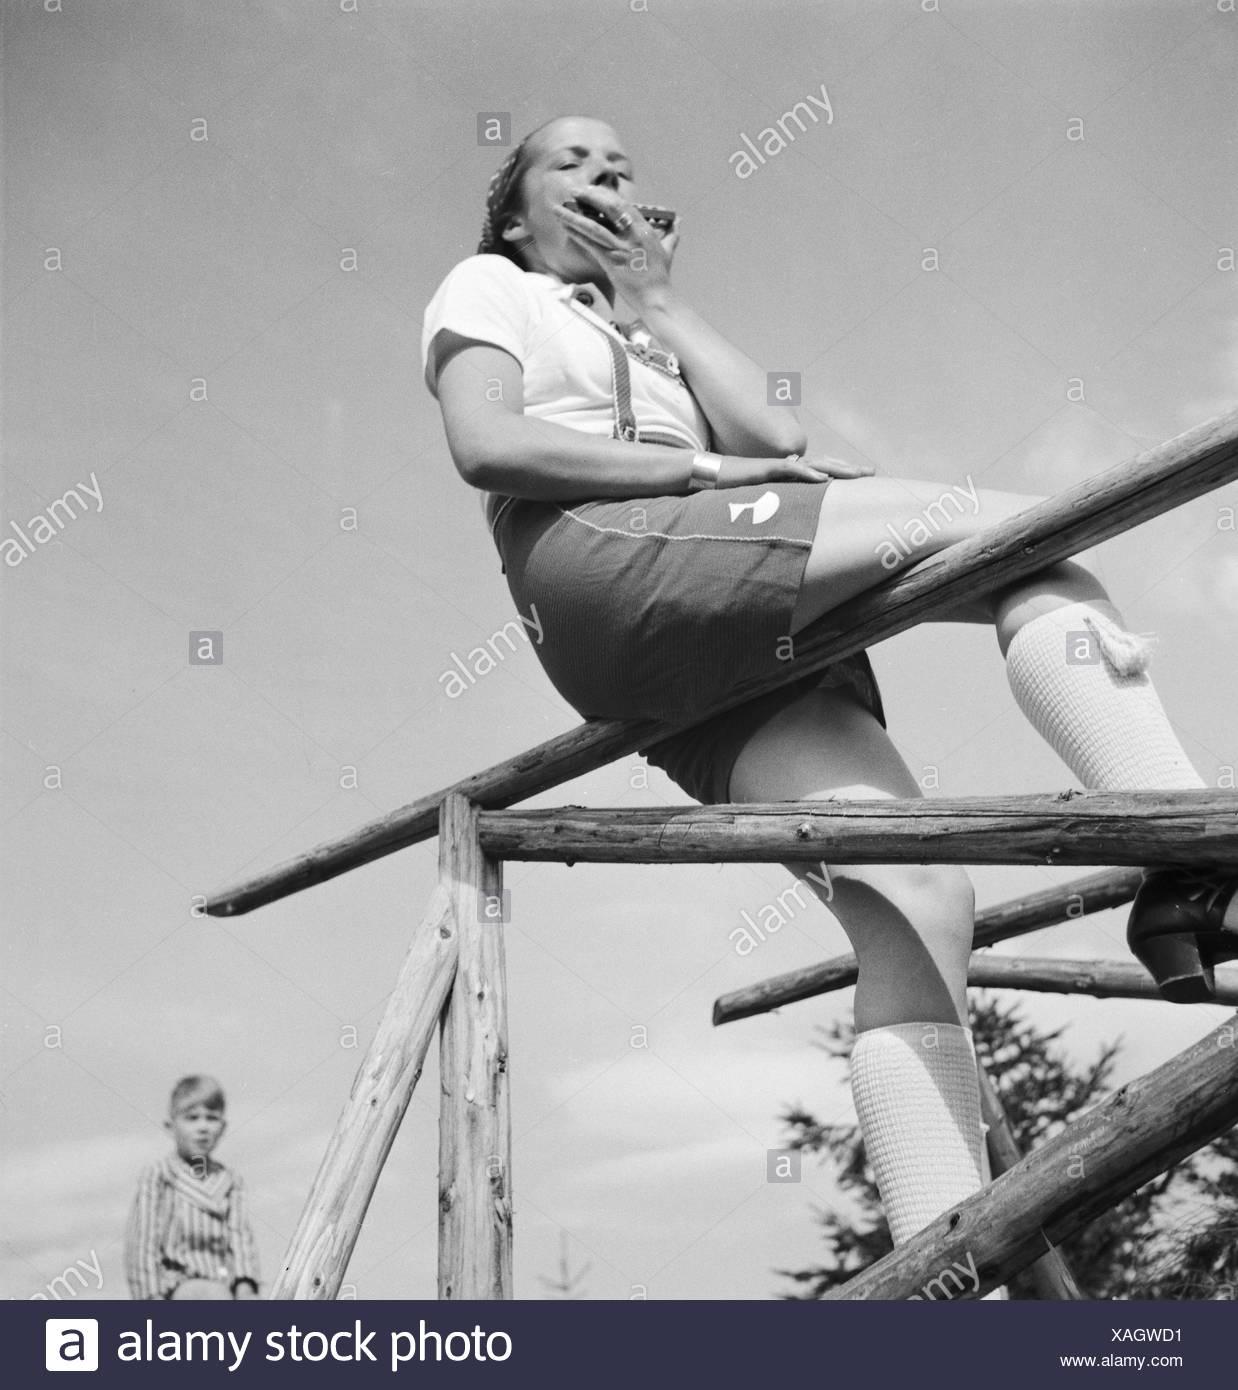 Eine junge Frau mit einer Mundharmonika auf einem Zaun, Deutschland er Jahre 1930. Uma mulher jovem com uma harmonica sobre uma cerca, Alemanha 1930. Imagens de Stock